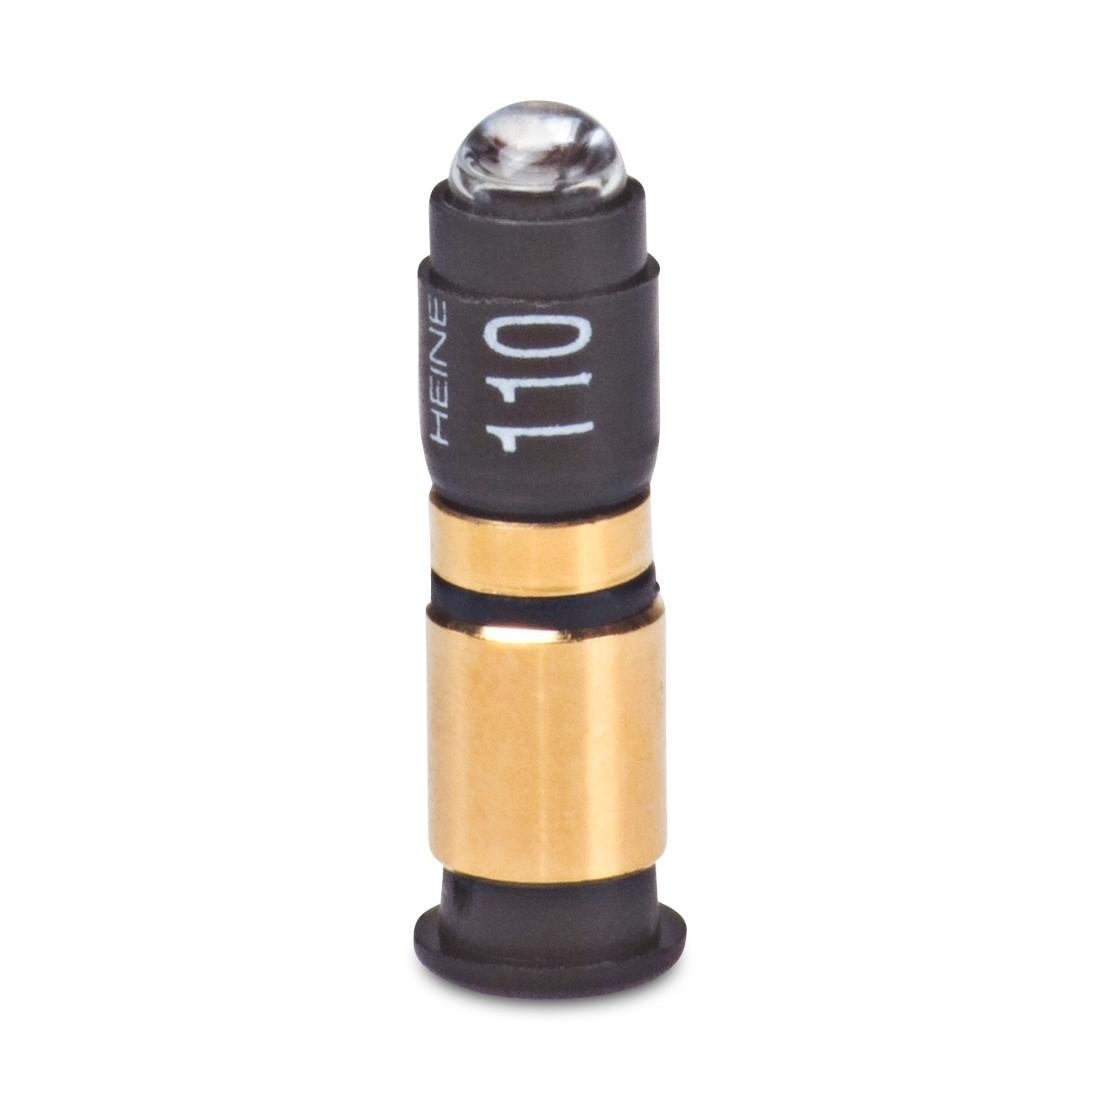 letzter Rabatt an vorderster Front der Zeit wo zu kaufen bachmaier Replacement bulb for otoscope Mini 3000